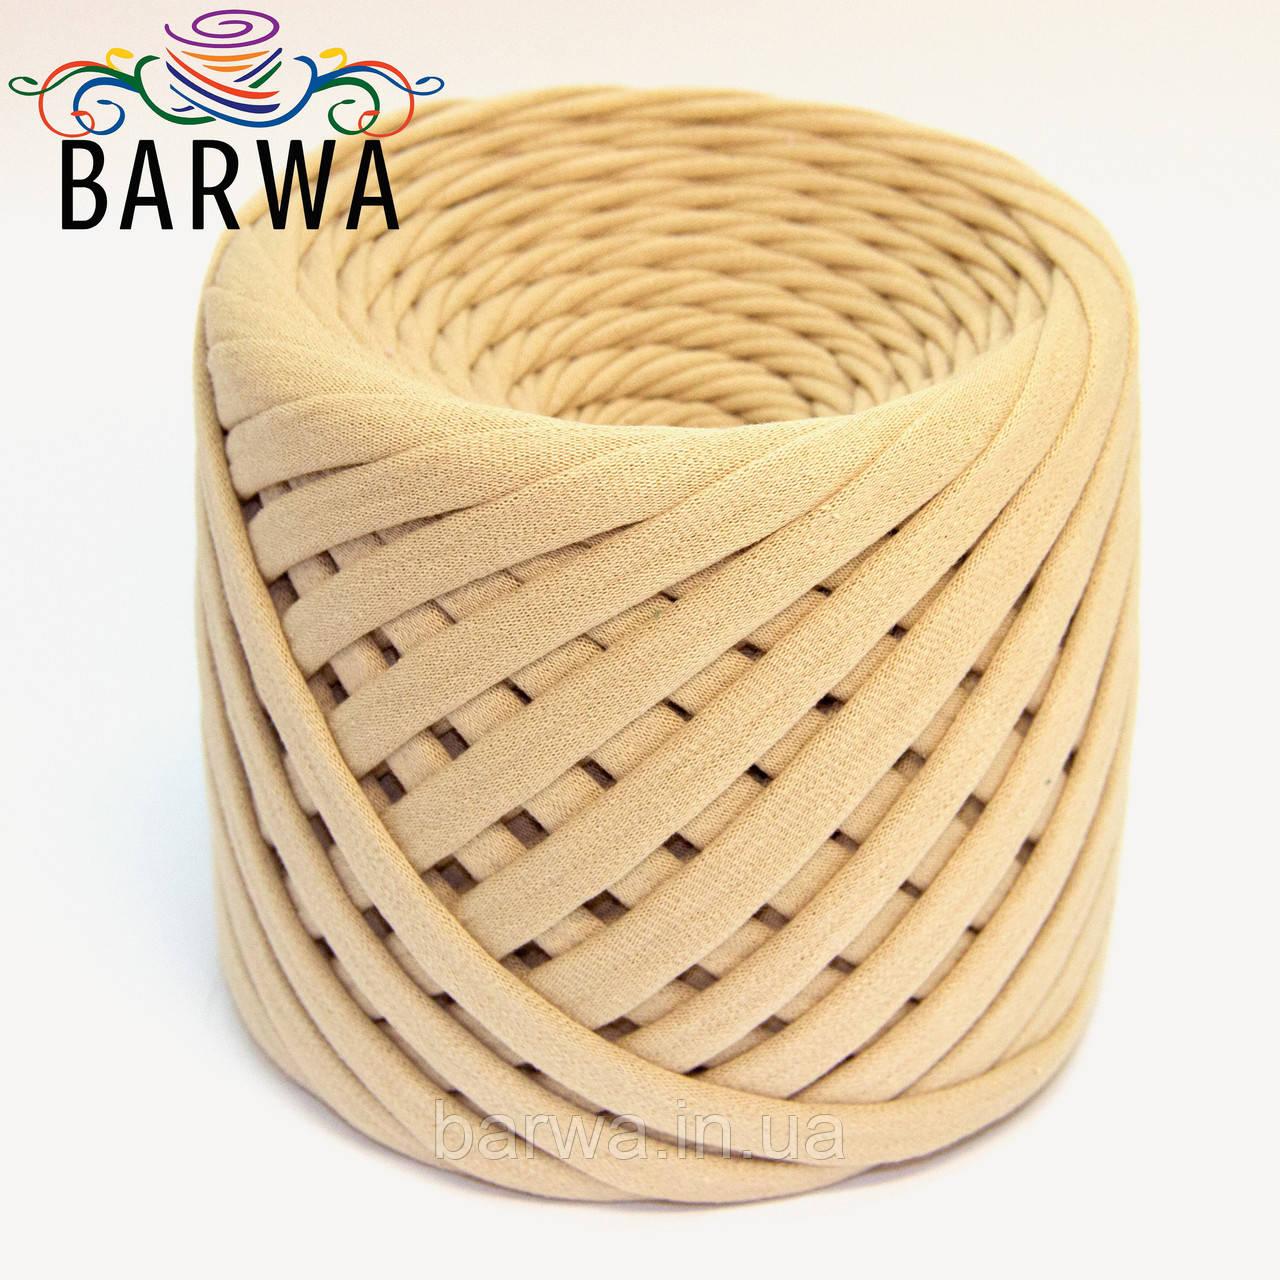 Трикотажная пряжа BARWA standart 7-9 мм. 50 м, цвет Имбирь